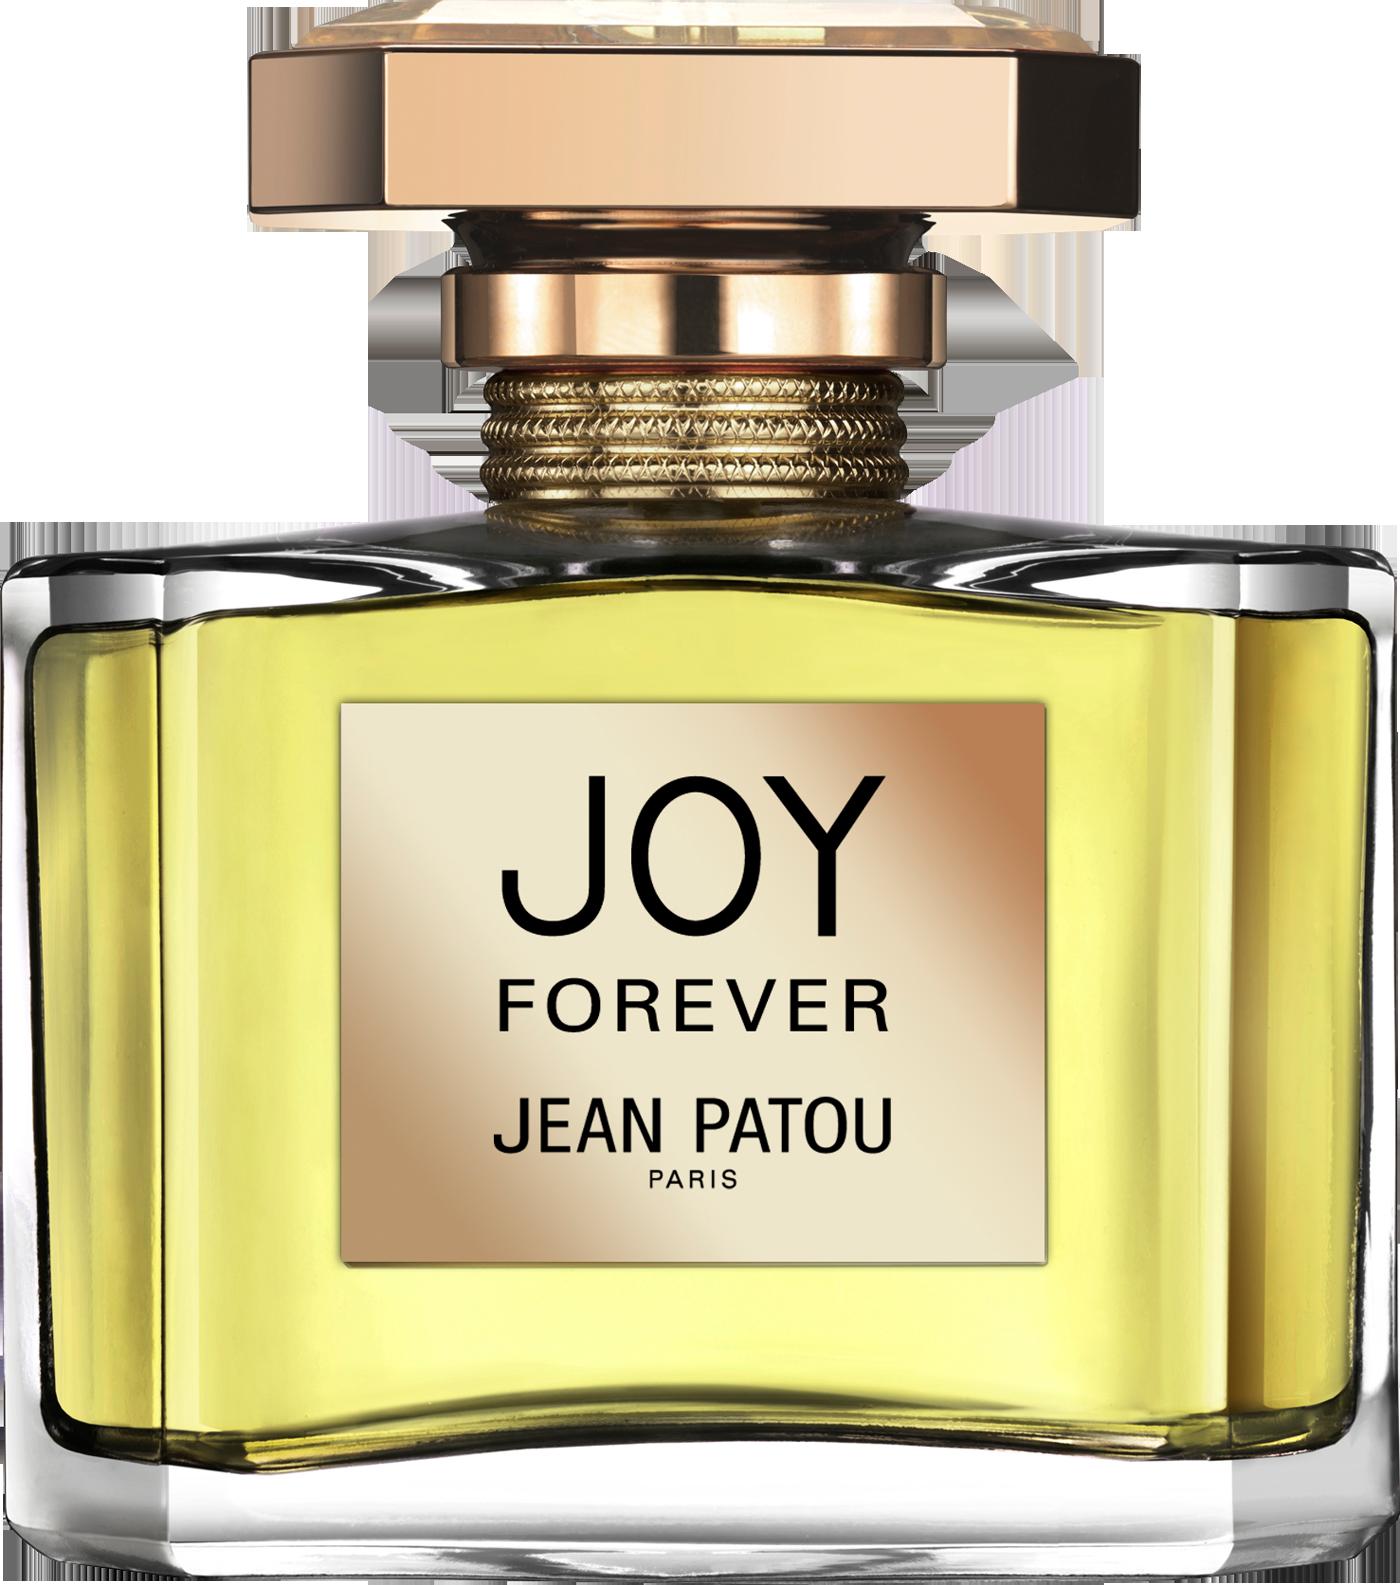 Png transparent free images. Perfume clipart perfume paris